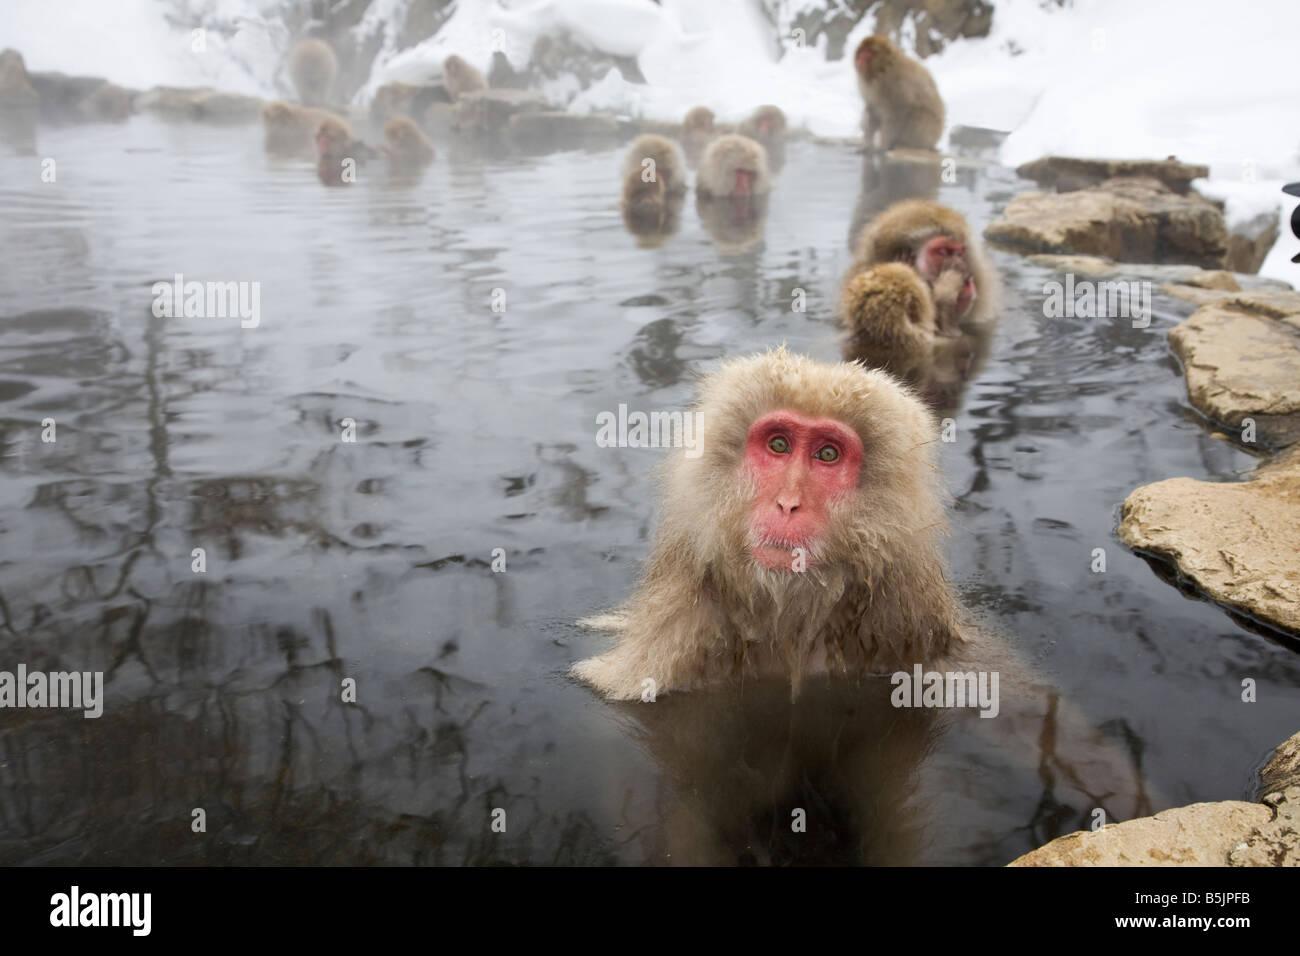 Nacional Jigokudani Monkey Park, Nagano, Japón: monos de nieve Japonés (Macaca fuscata) en invierno Imagen De Stock